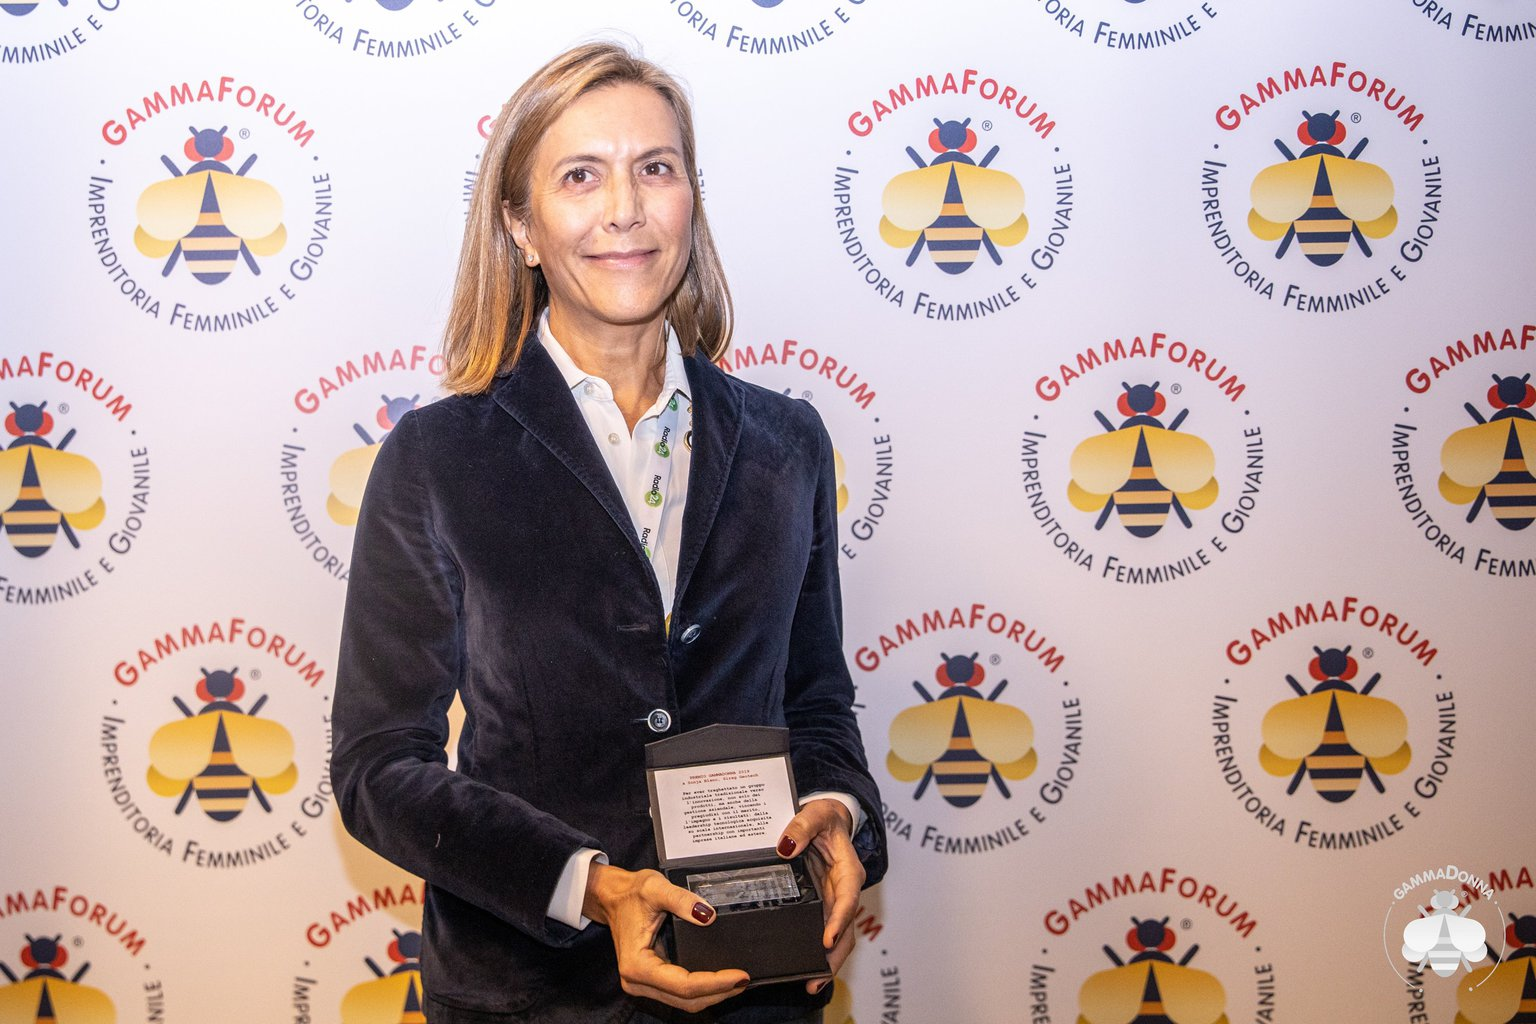 Sonja Blanc, Sireg Geotech, vince il Premio GammaDonna 2019